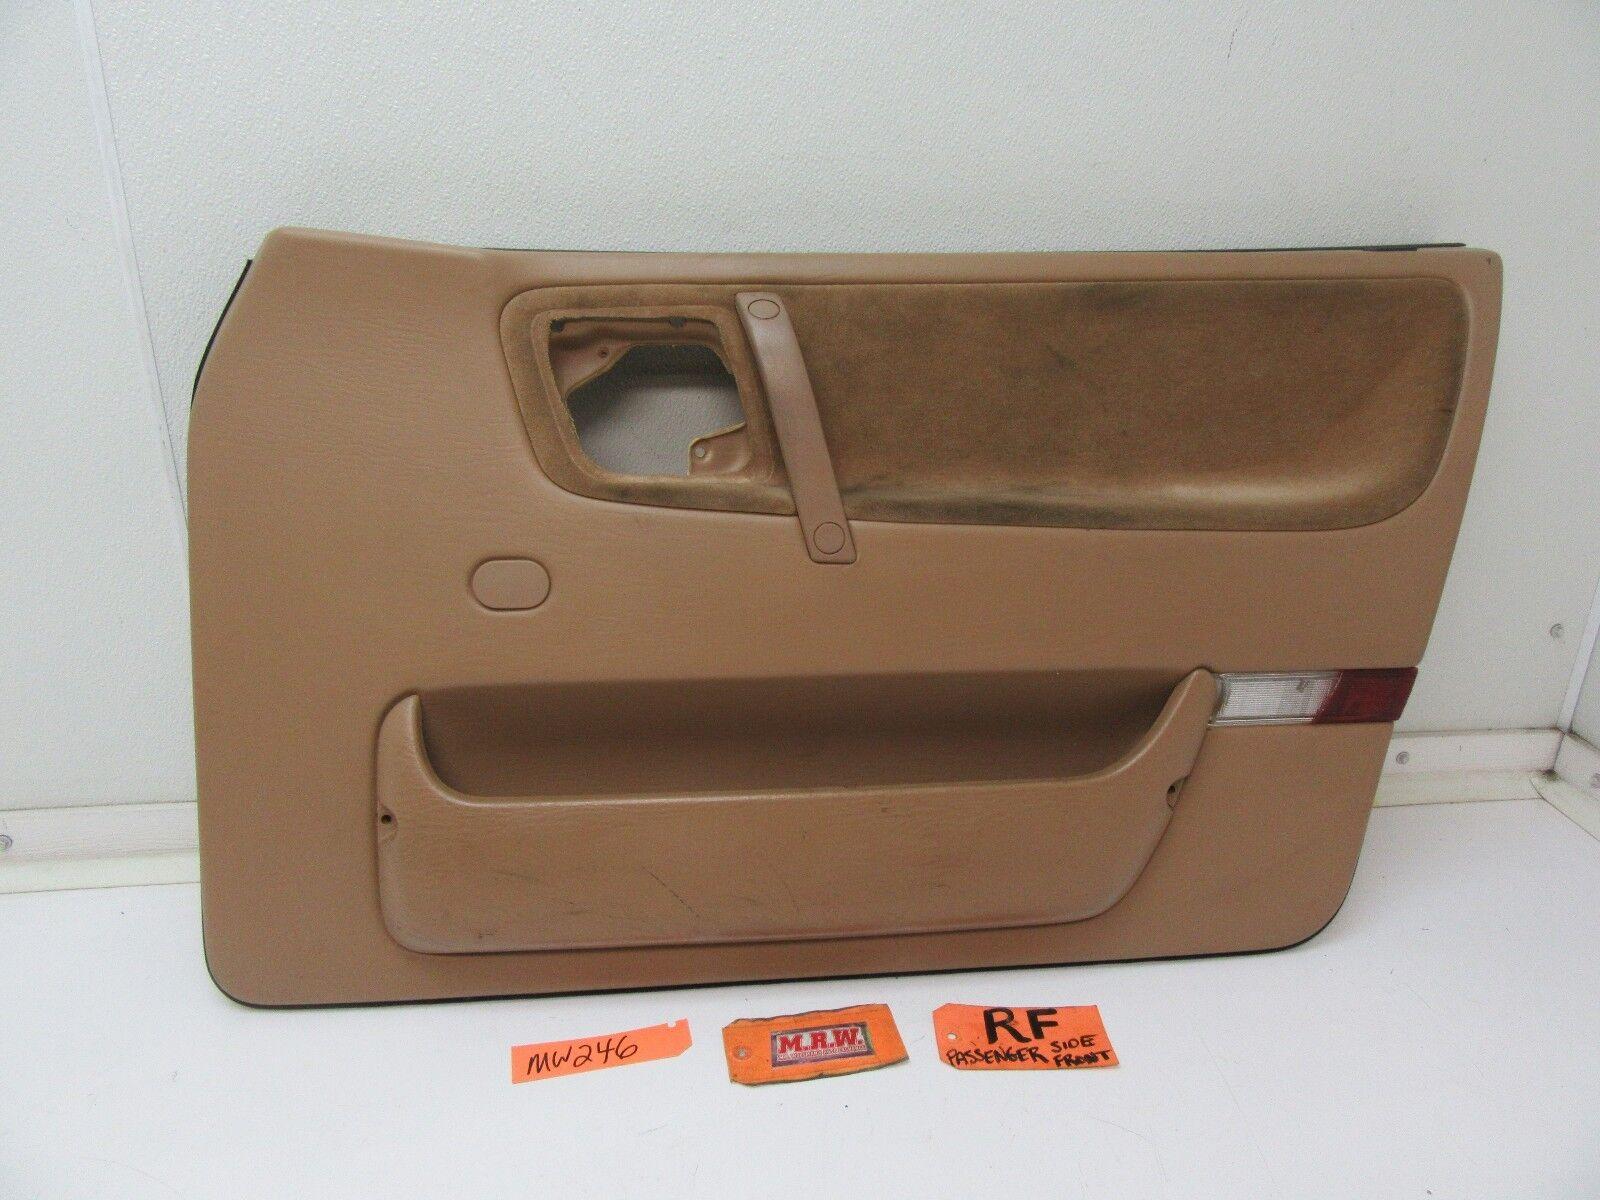 Used saab 9000 interior door panels parts for sale 1993 1998 saab 9000 front door panel right r rh rf passenger interior trim power eventelaan Image collections